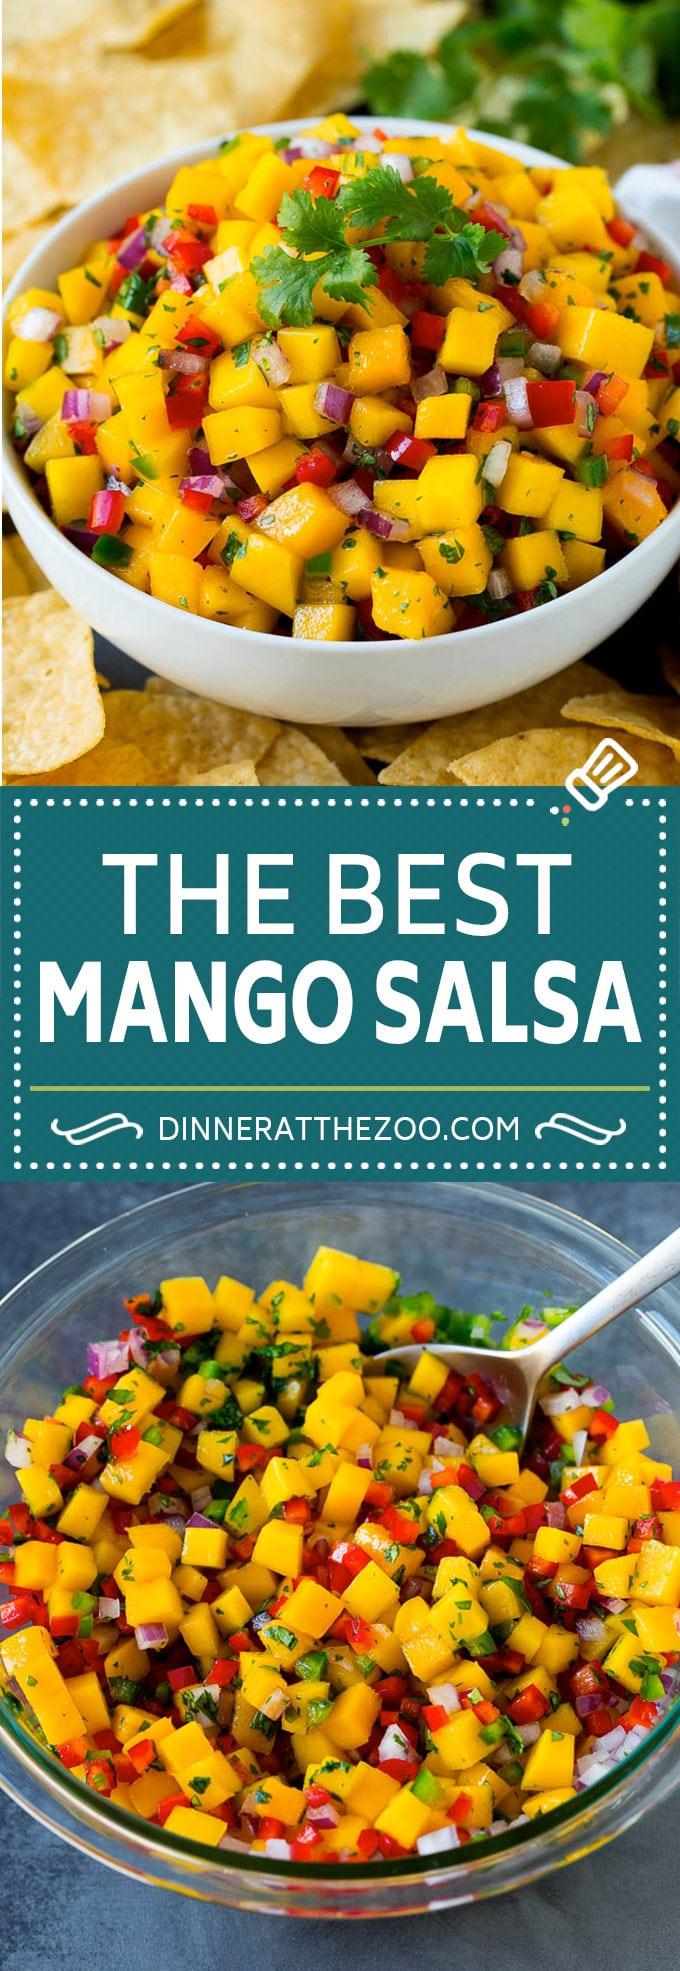 Mango Salsa Recipe #mango #salsa #healthy #appetizer #dinneratthezoo